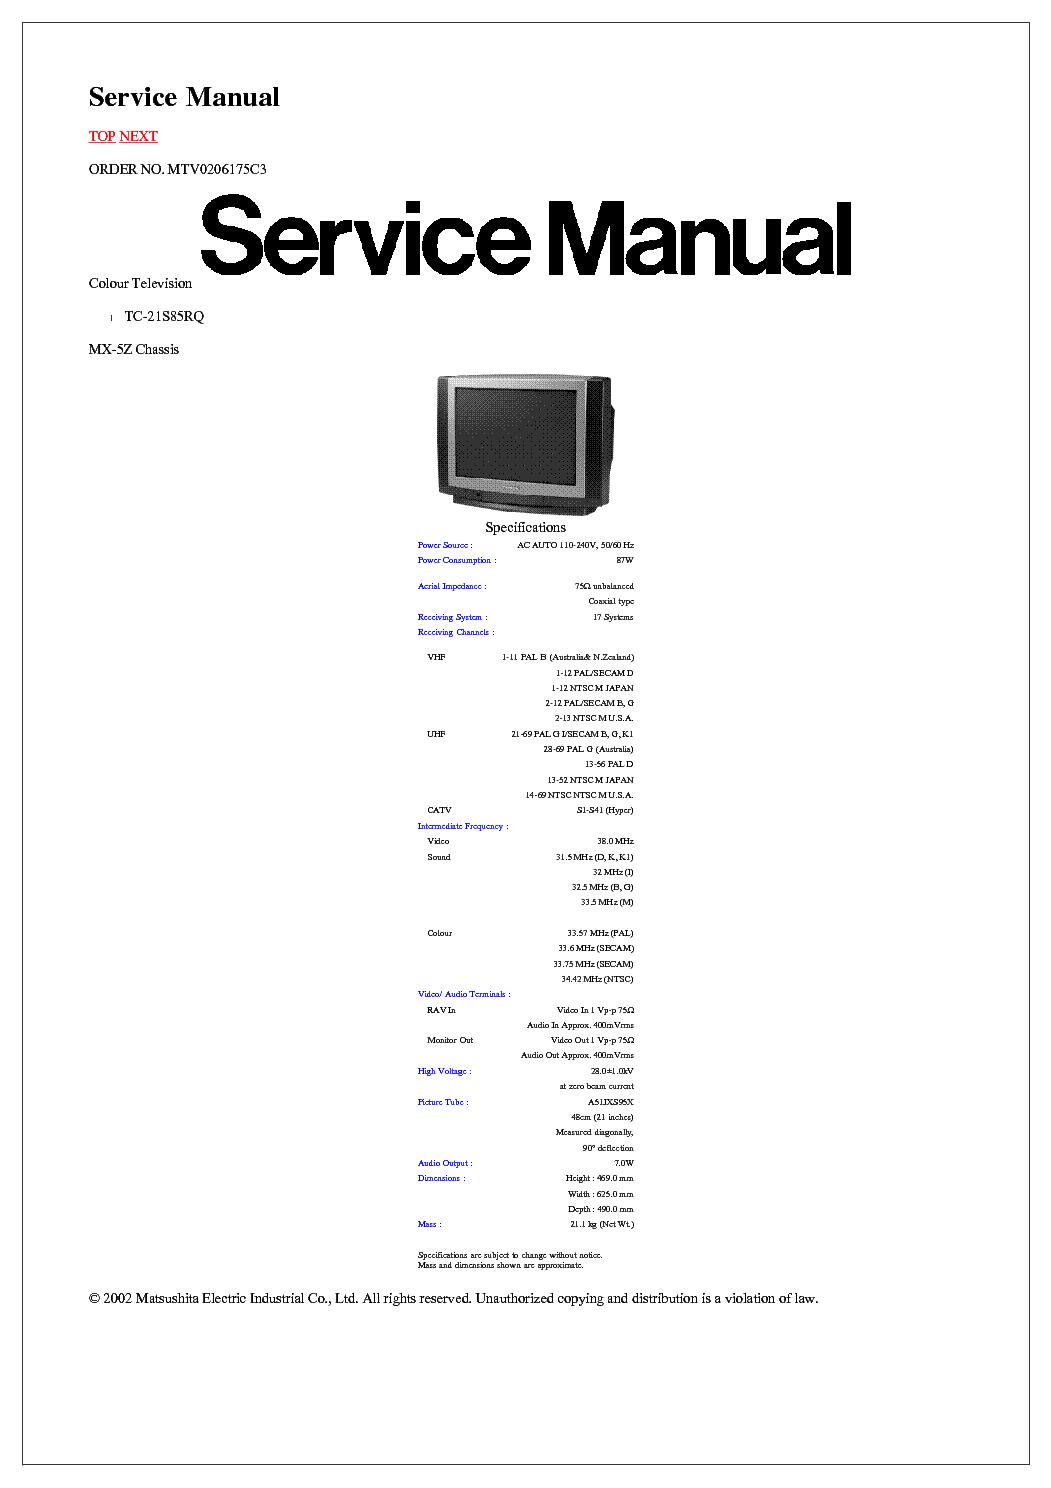 panasonic tv instruction manuals